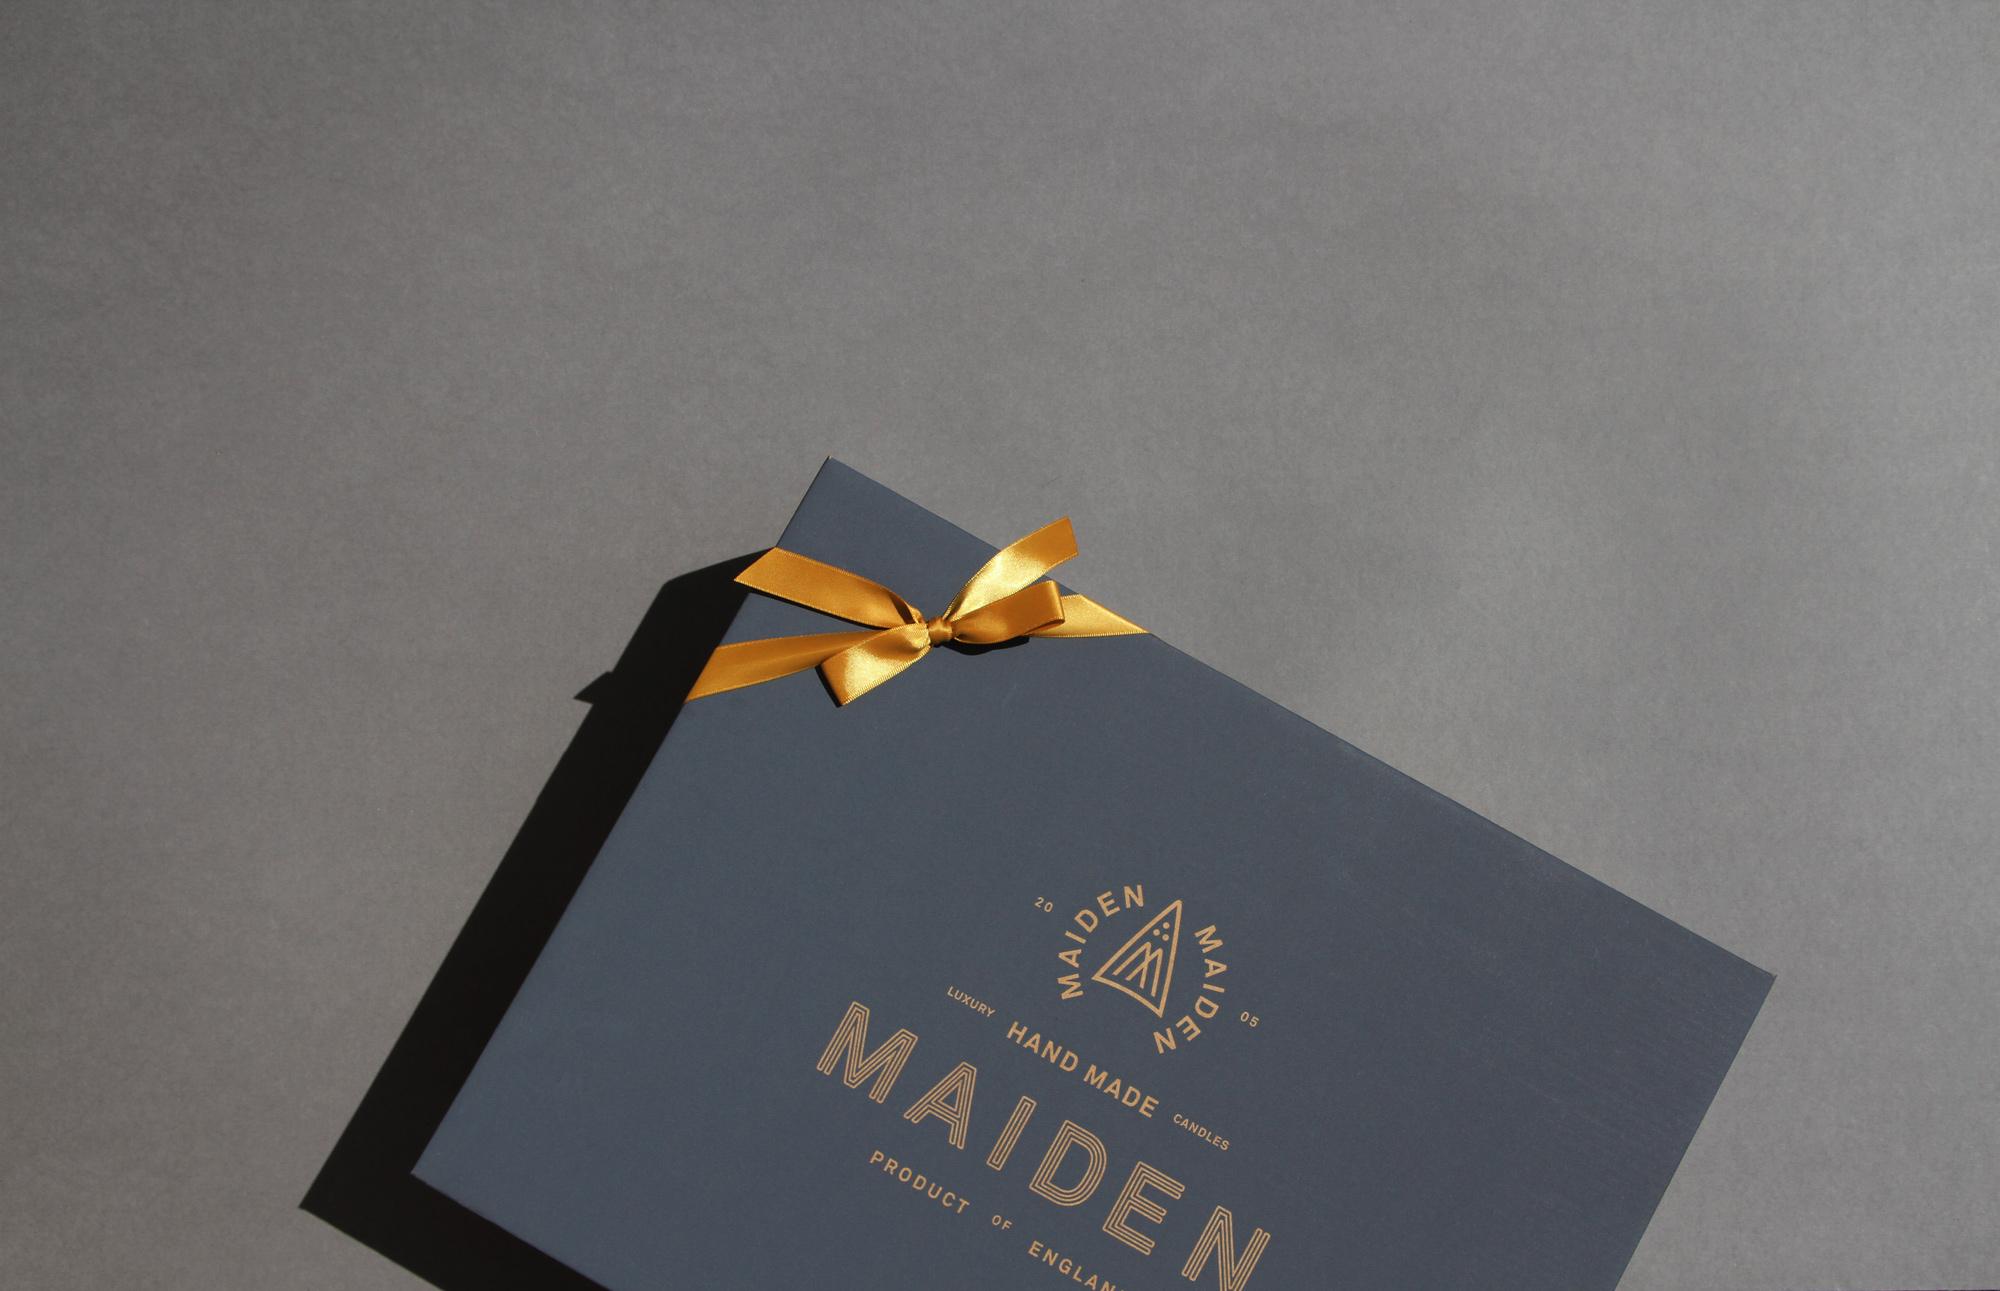 New Work — Coming Soon.MAIDEN / BRANDING + PACKAGING.#logo #Brand #Branding #Design #Graphicdesign #Luxury #pattern #packagingdesign #packaging #British #NewRelease #Style #contemporary #handmade #london #dorset #graphicdesigner #graphicdesign #designagency #brandingagency #experience #candles #luxury #luxurydesign #luxurylifestyle